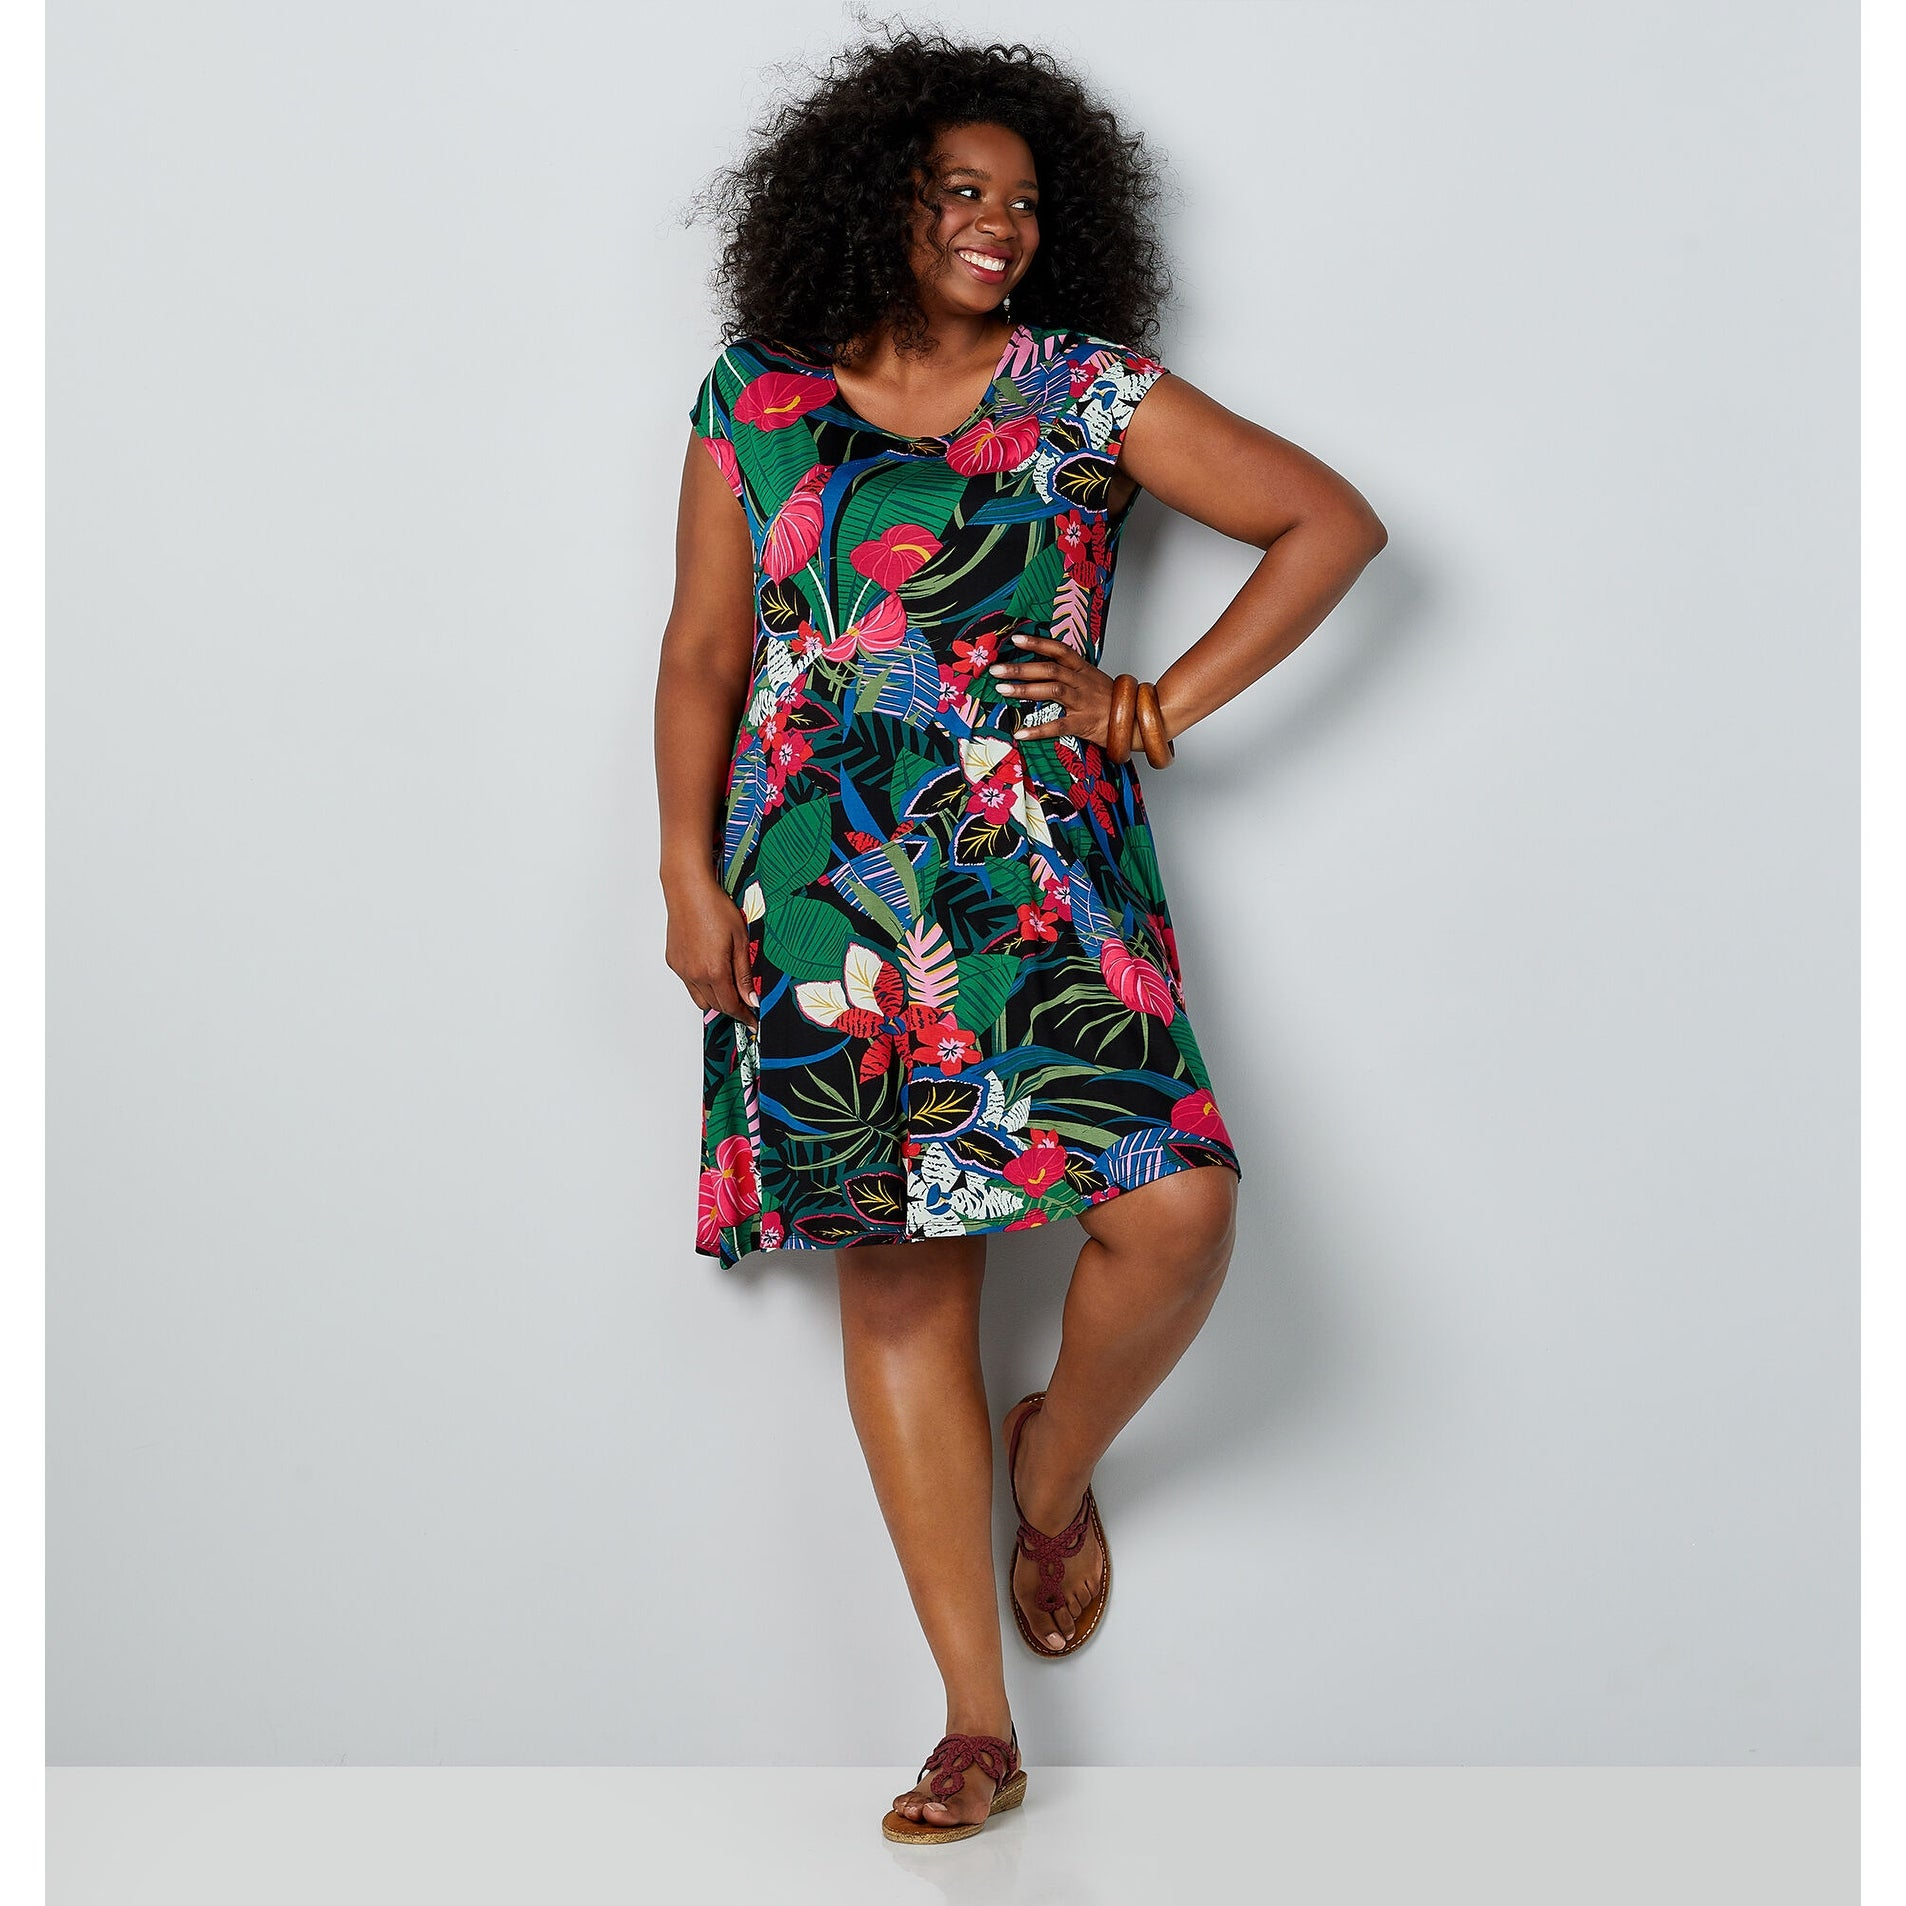 AVENUE Women\'s Tropical Print Bias Cut Dress - Olive